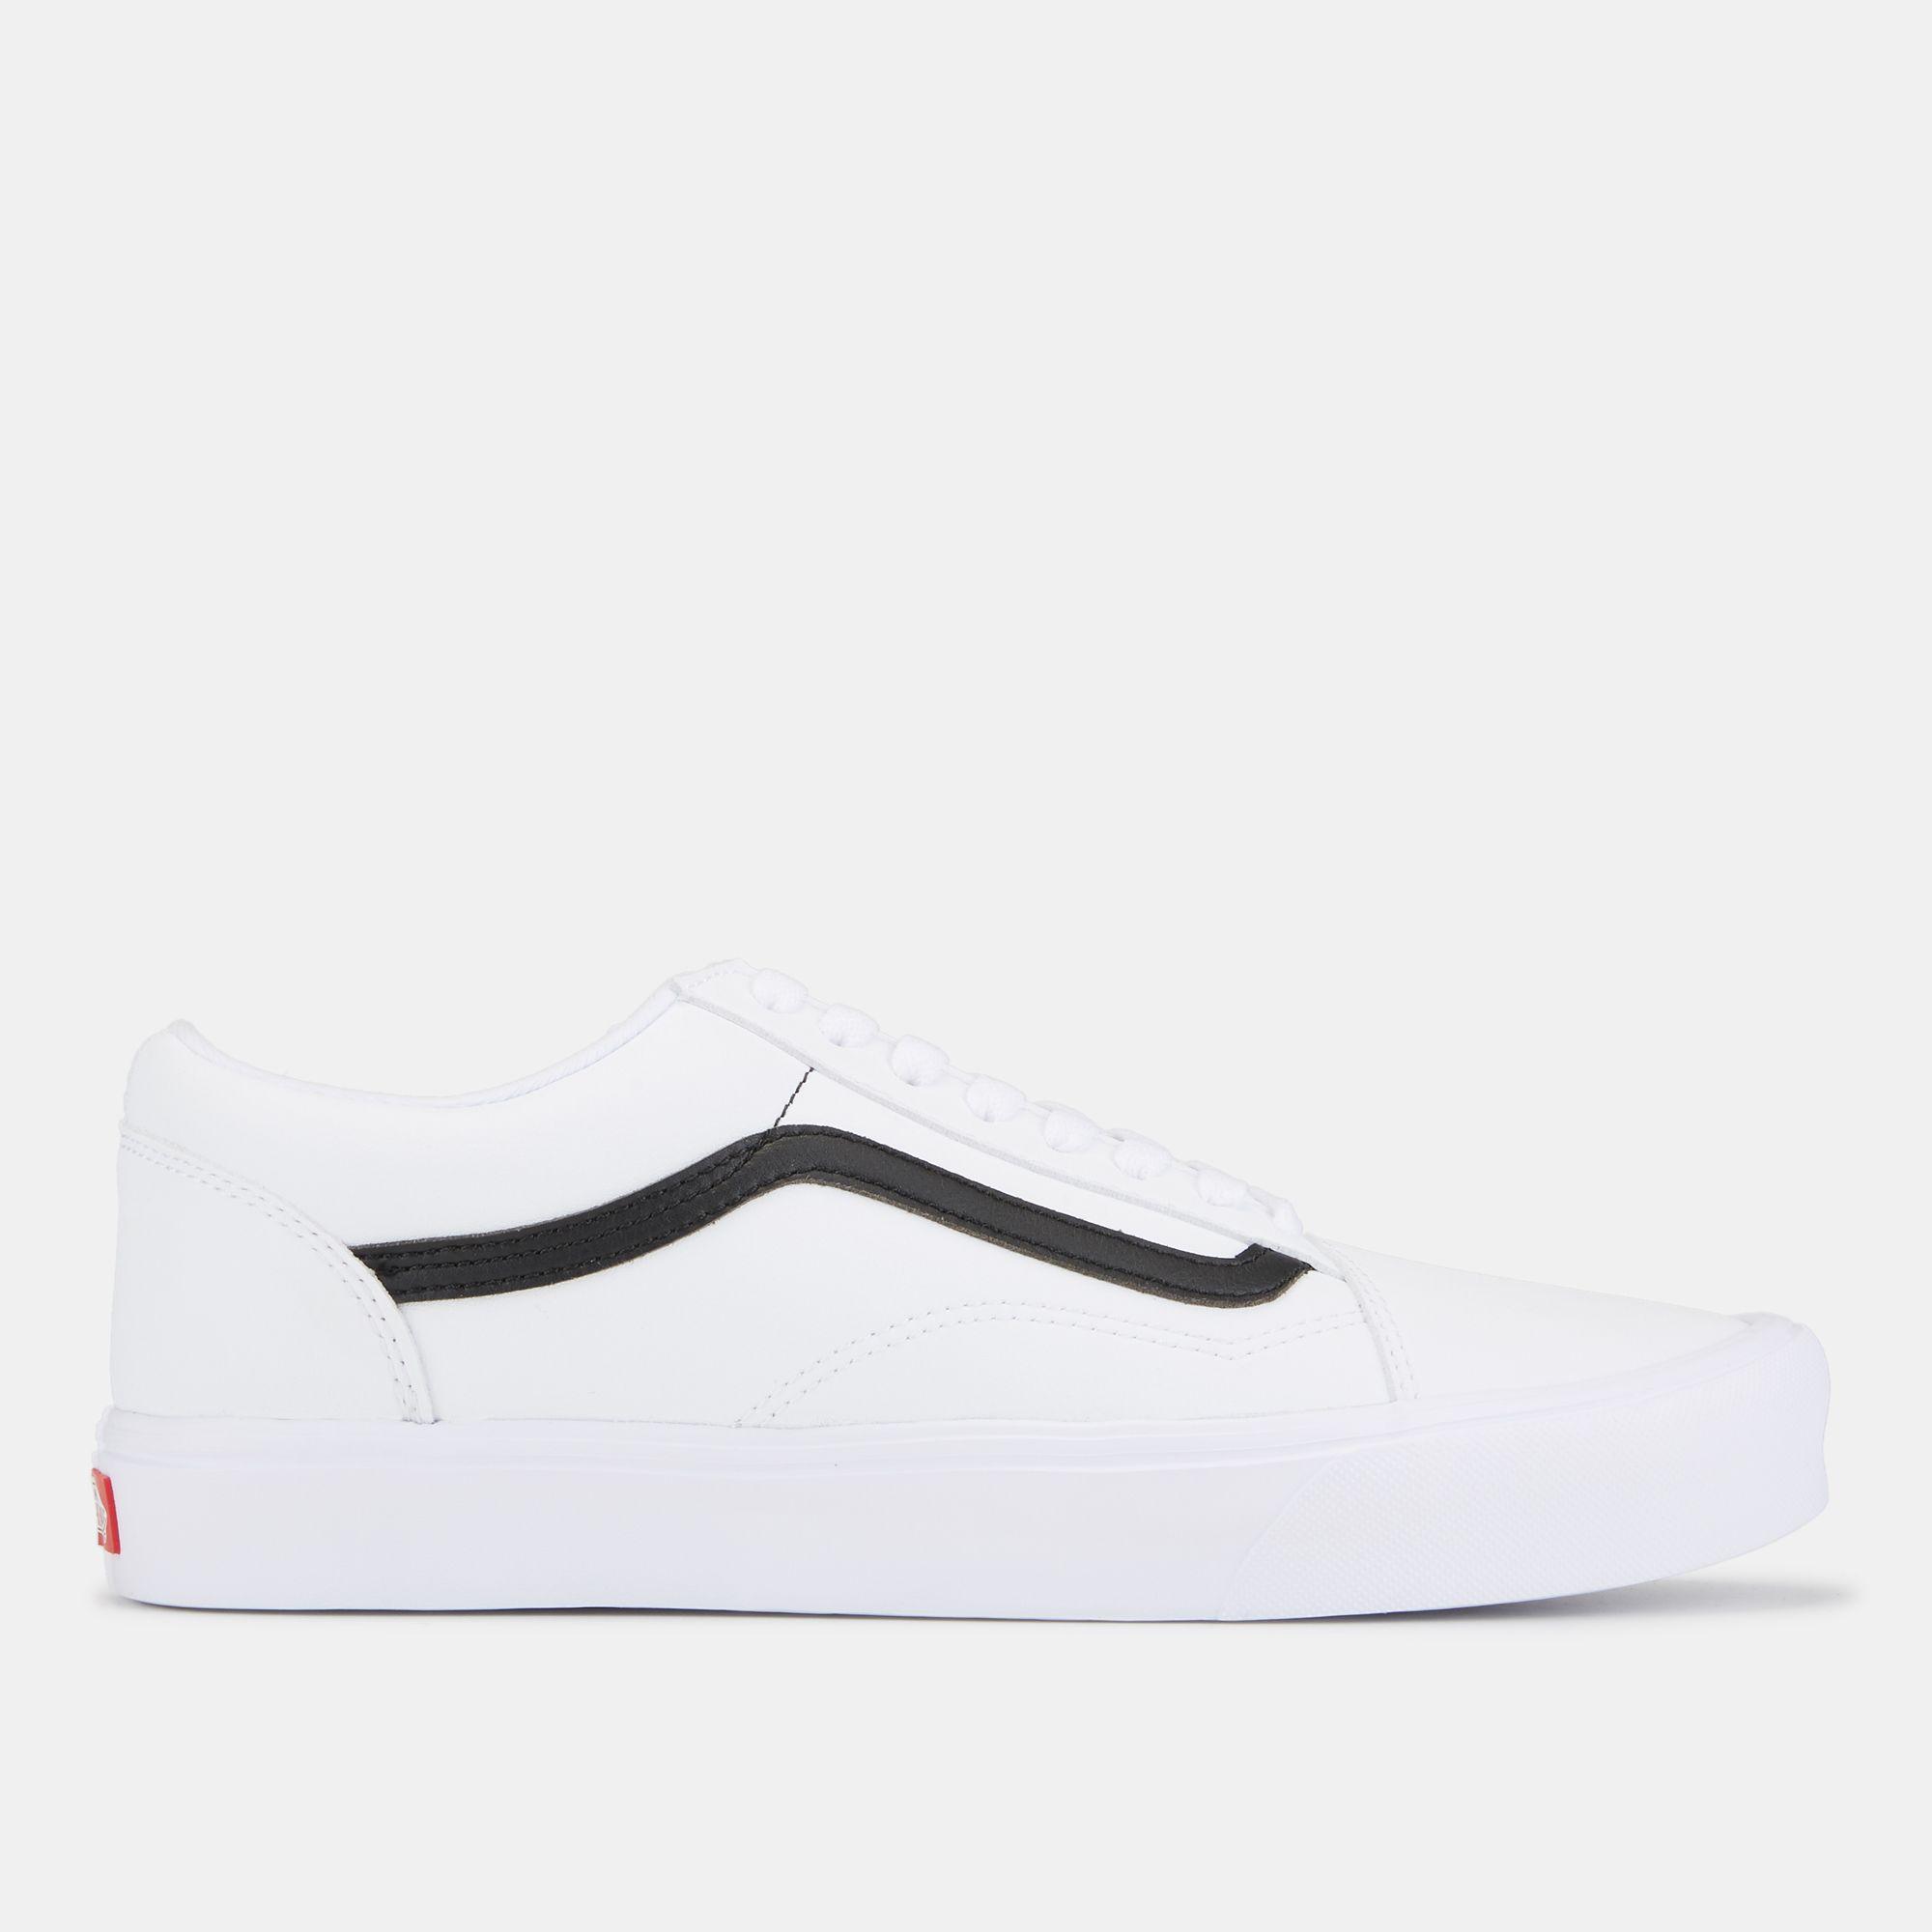 Vans Old Skool Lite Shoe | Sneakers | Shoes | Women's Sale | Sale | SSS